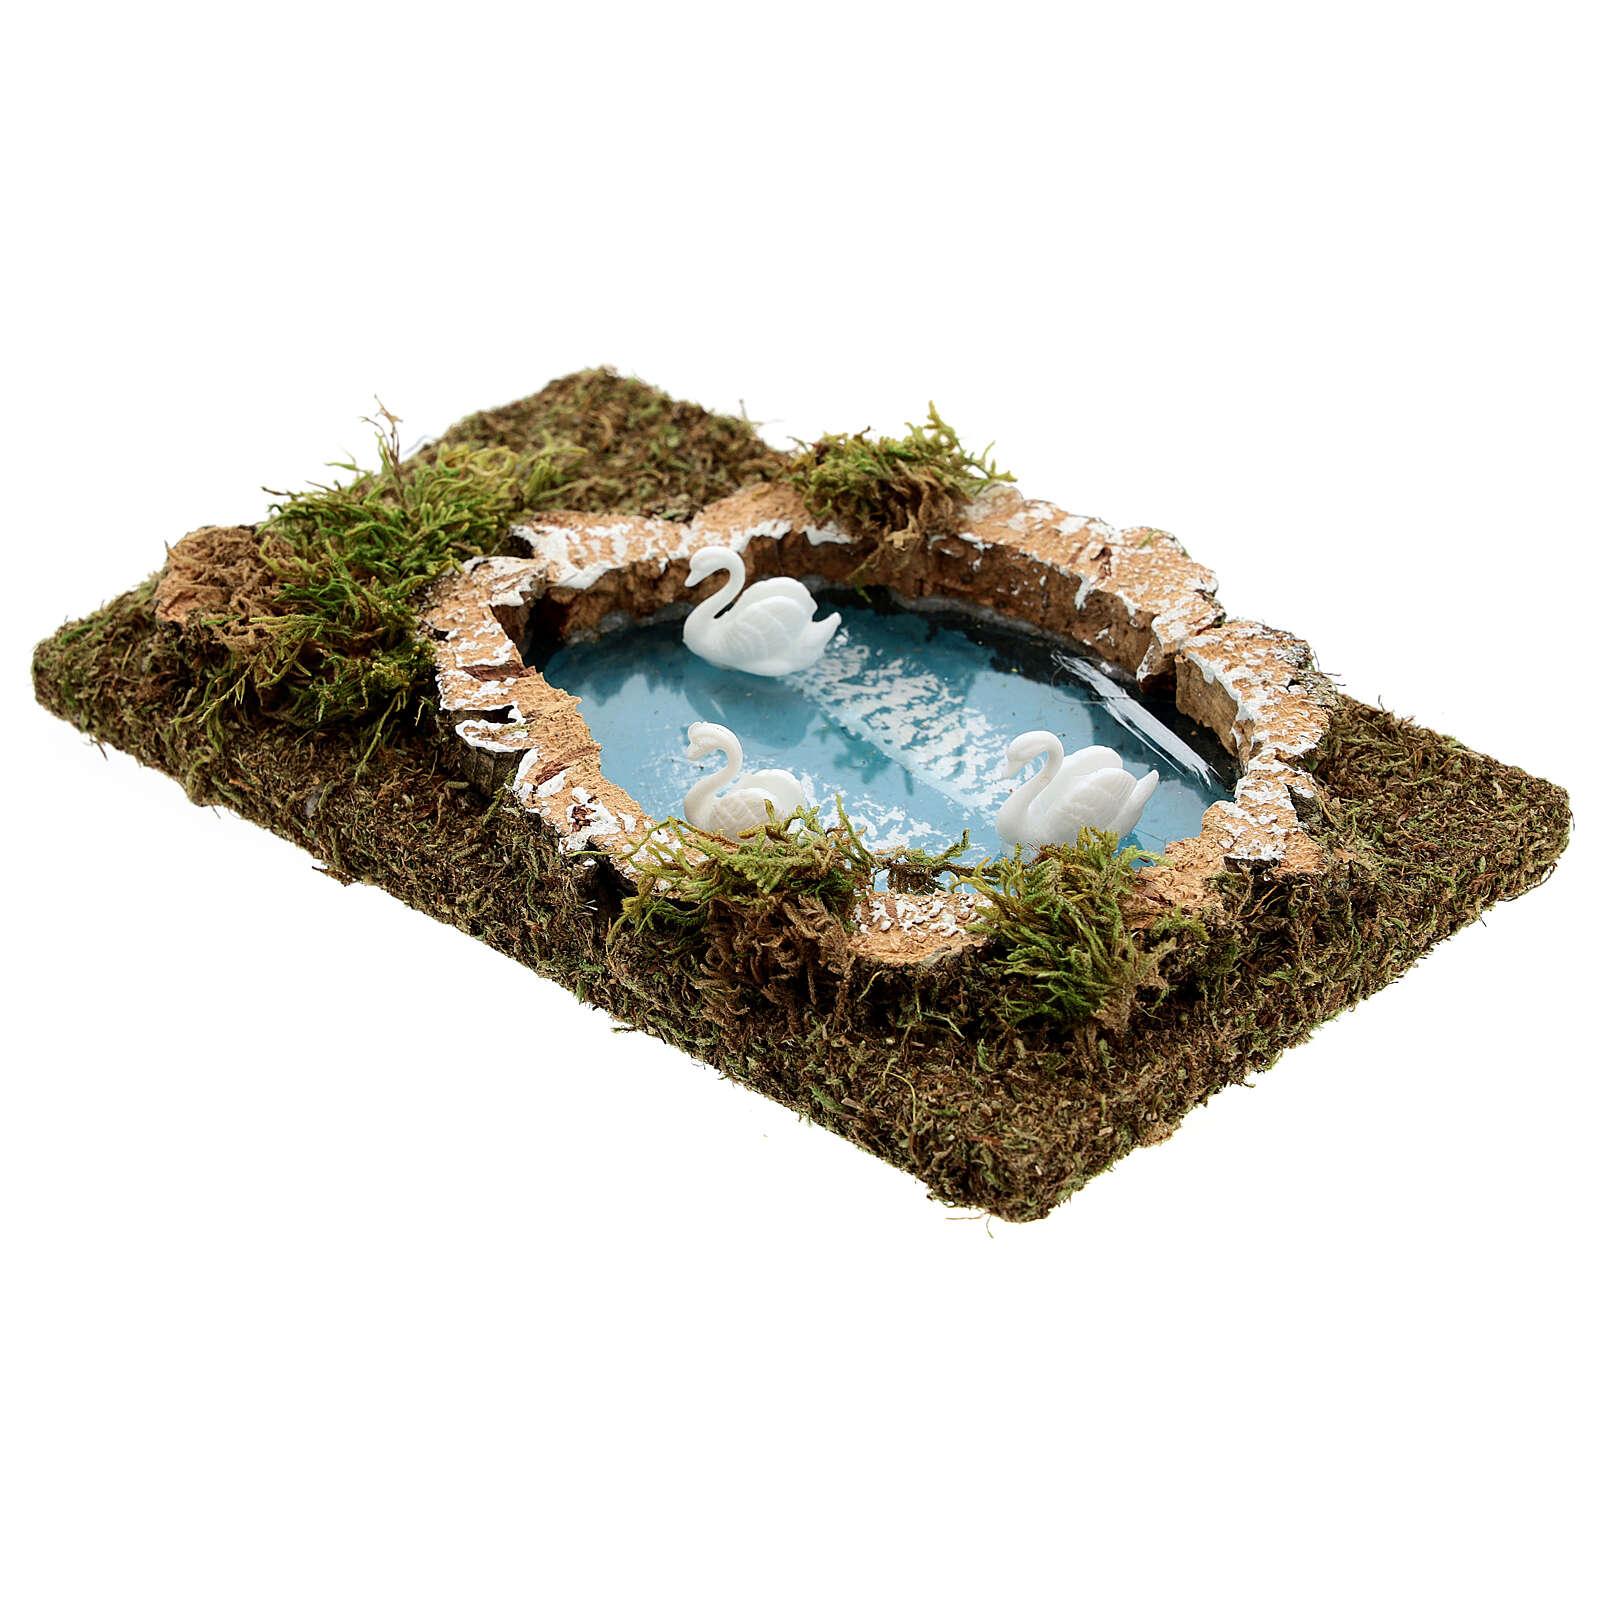 Mini lac avec cygnes pour crèche 20x13 4